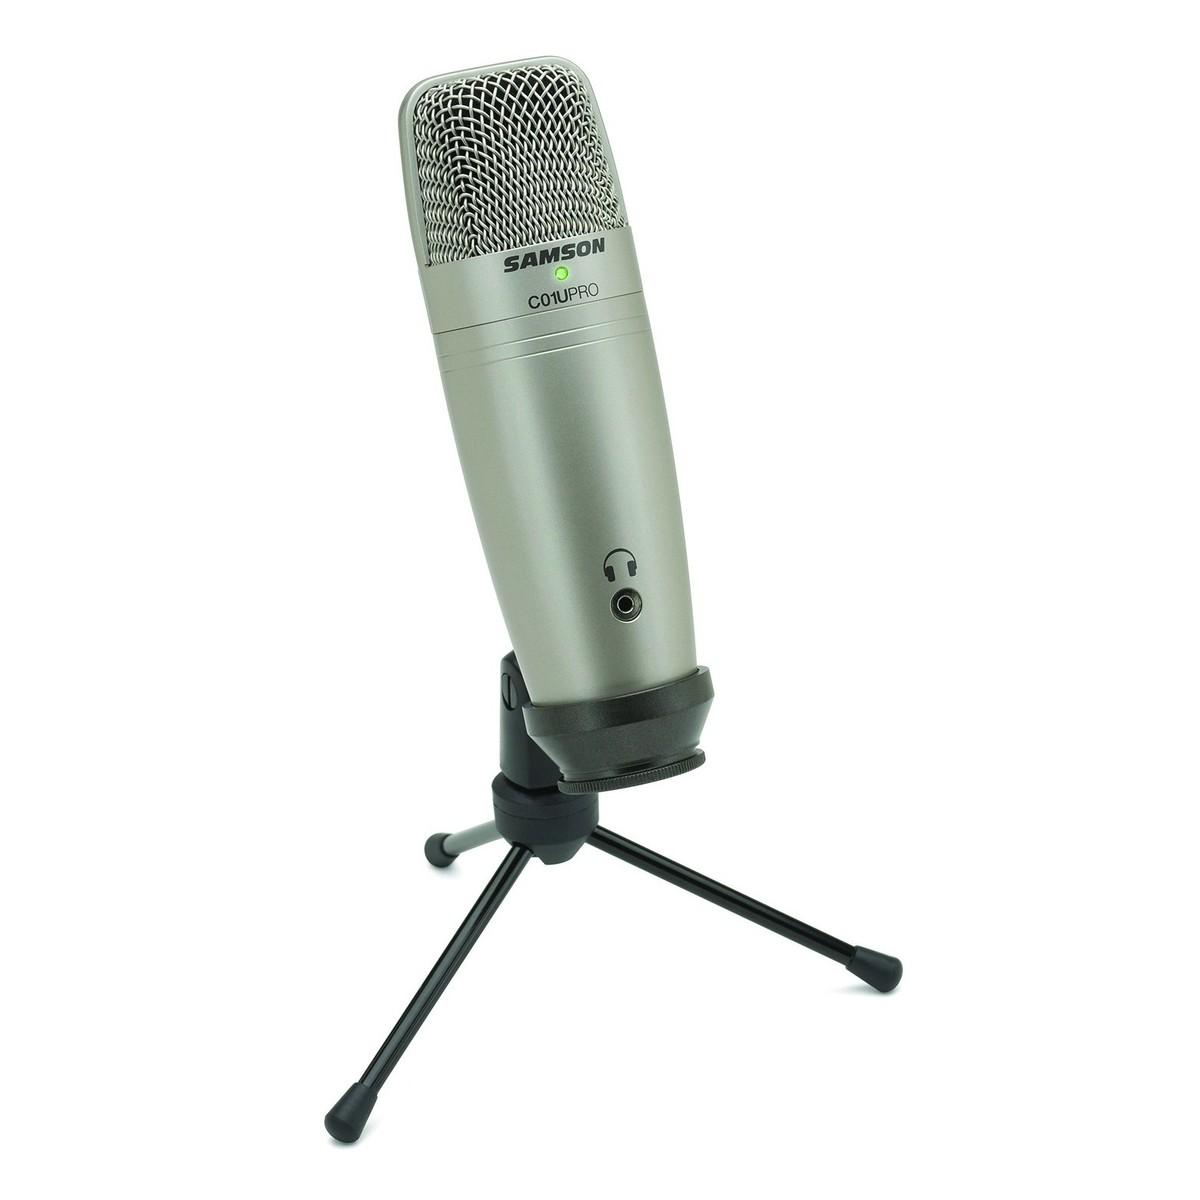 samson c01u pro usb studio condenser microphone at gear4music. Black Bedroom Furniture Sets. Home Design Ideas